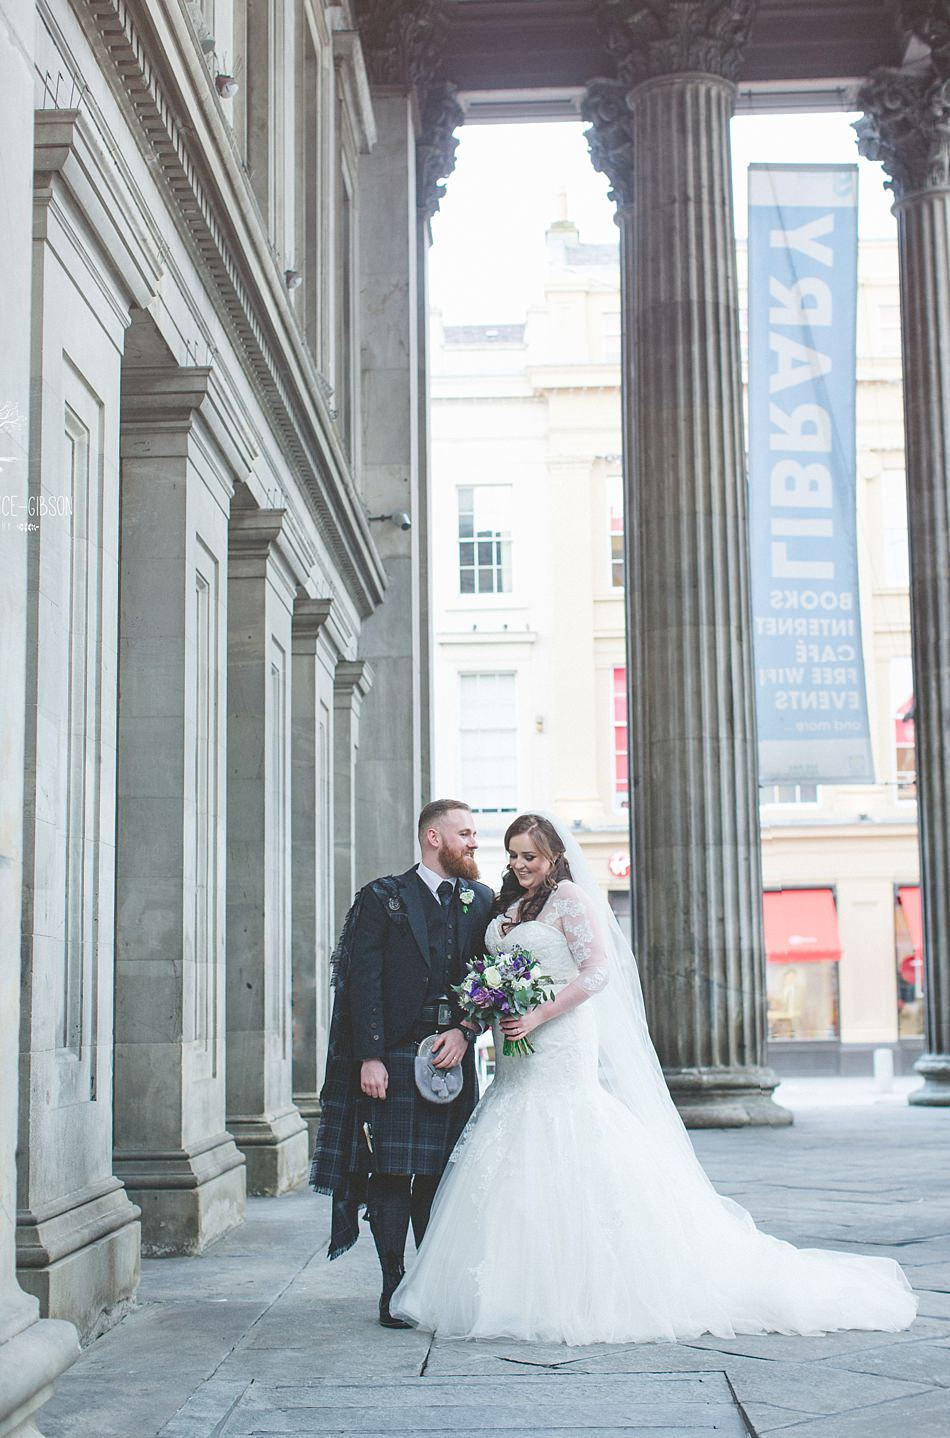 wedding glasgow city 29 5-4.jpg